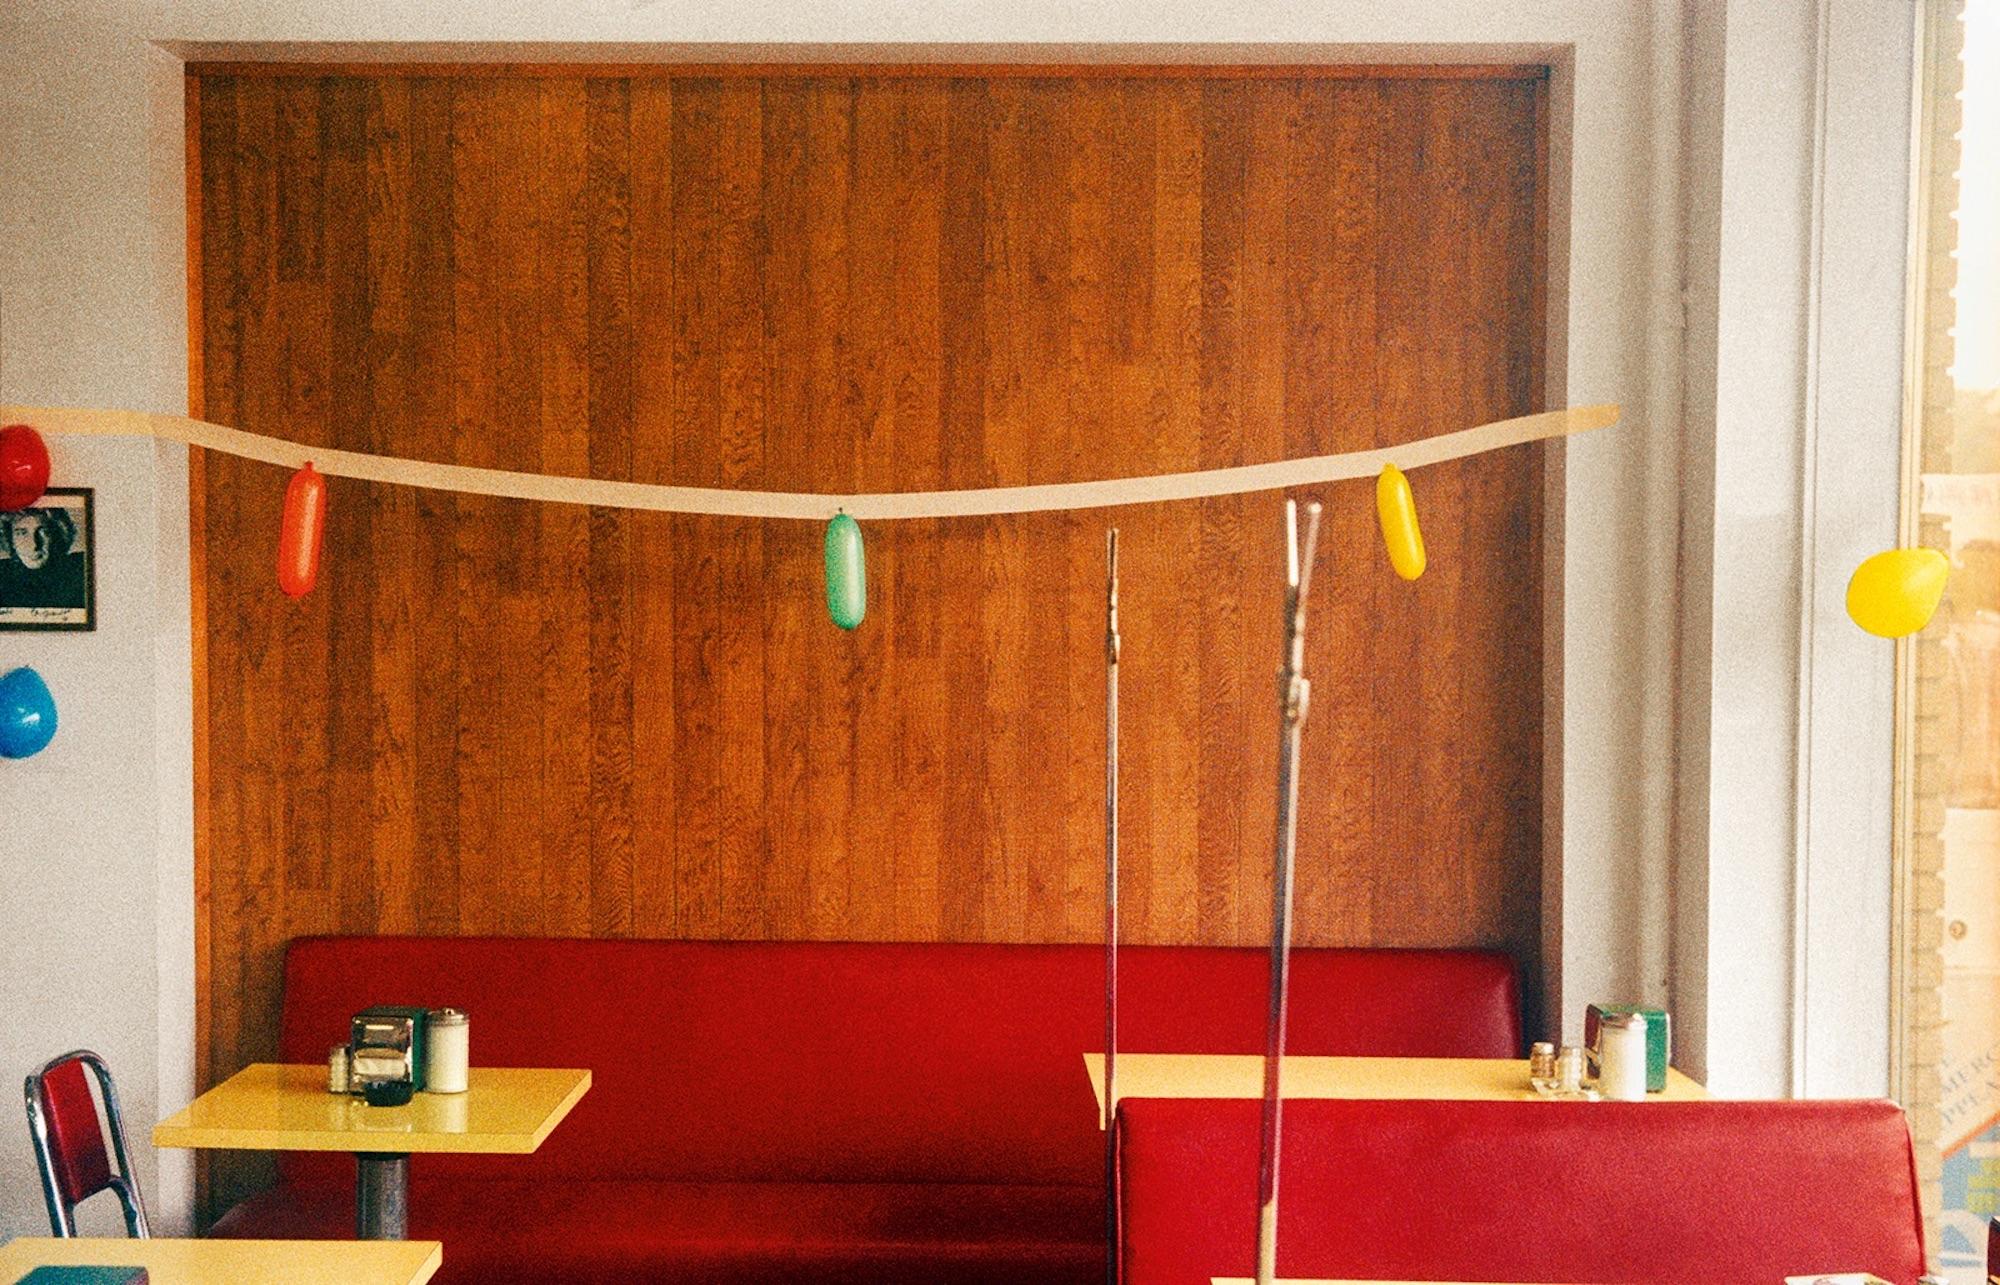 William Eggleston, Untitled, c.1983 - 1986 © Eggleston Artistic Trust. Courtesy Eggleston Artistic Trust and David Zwirner